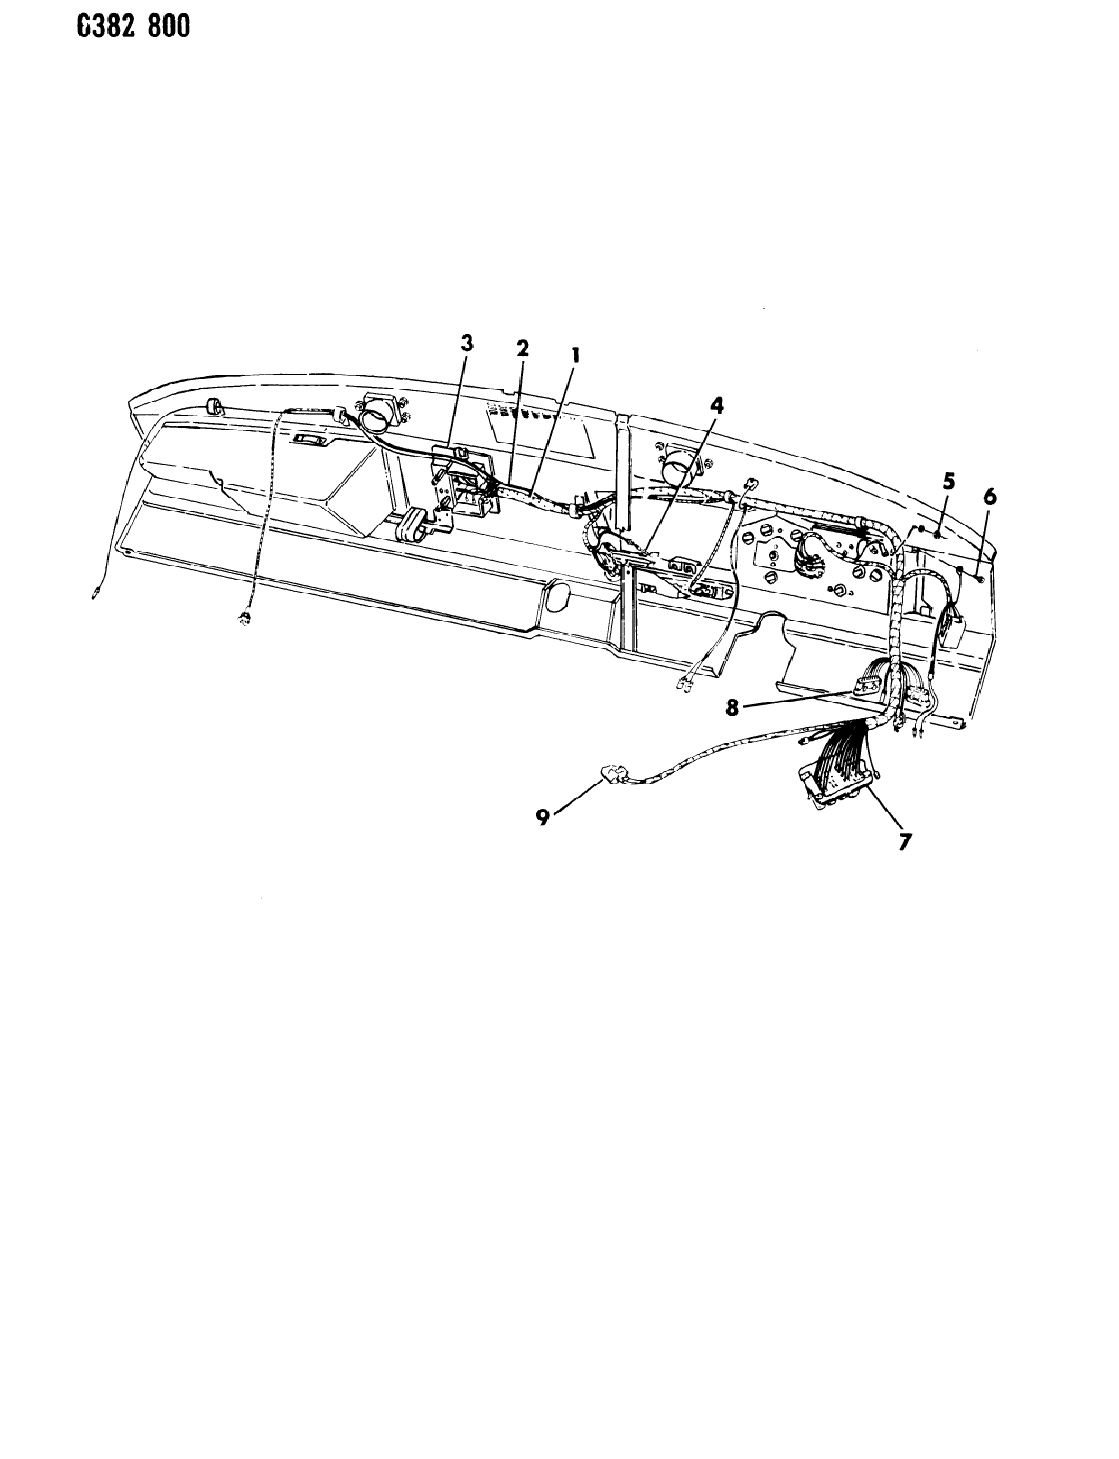 1987 Dodge D350 Instrument Panel Wiring